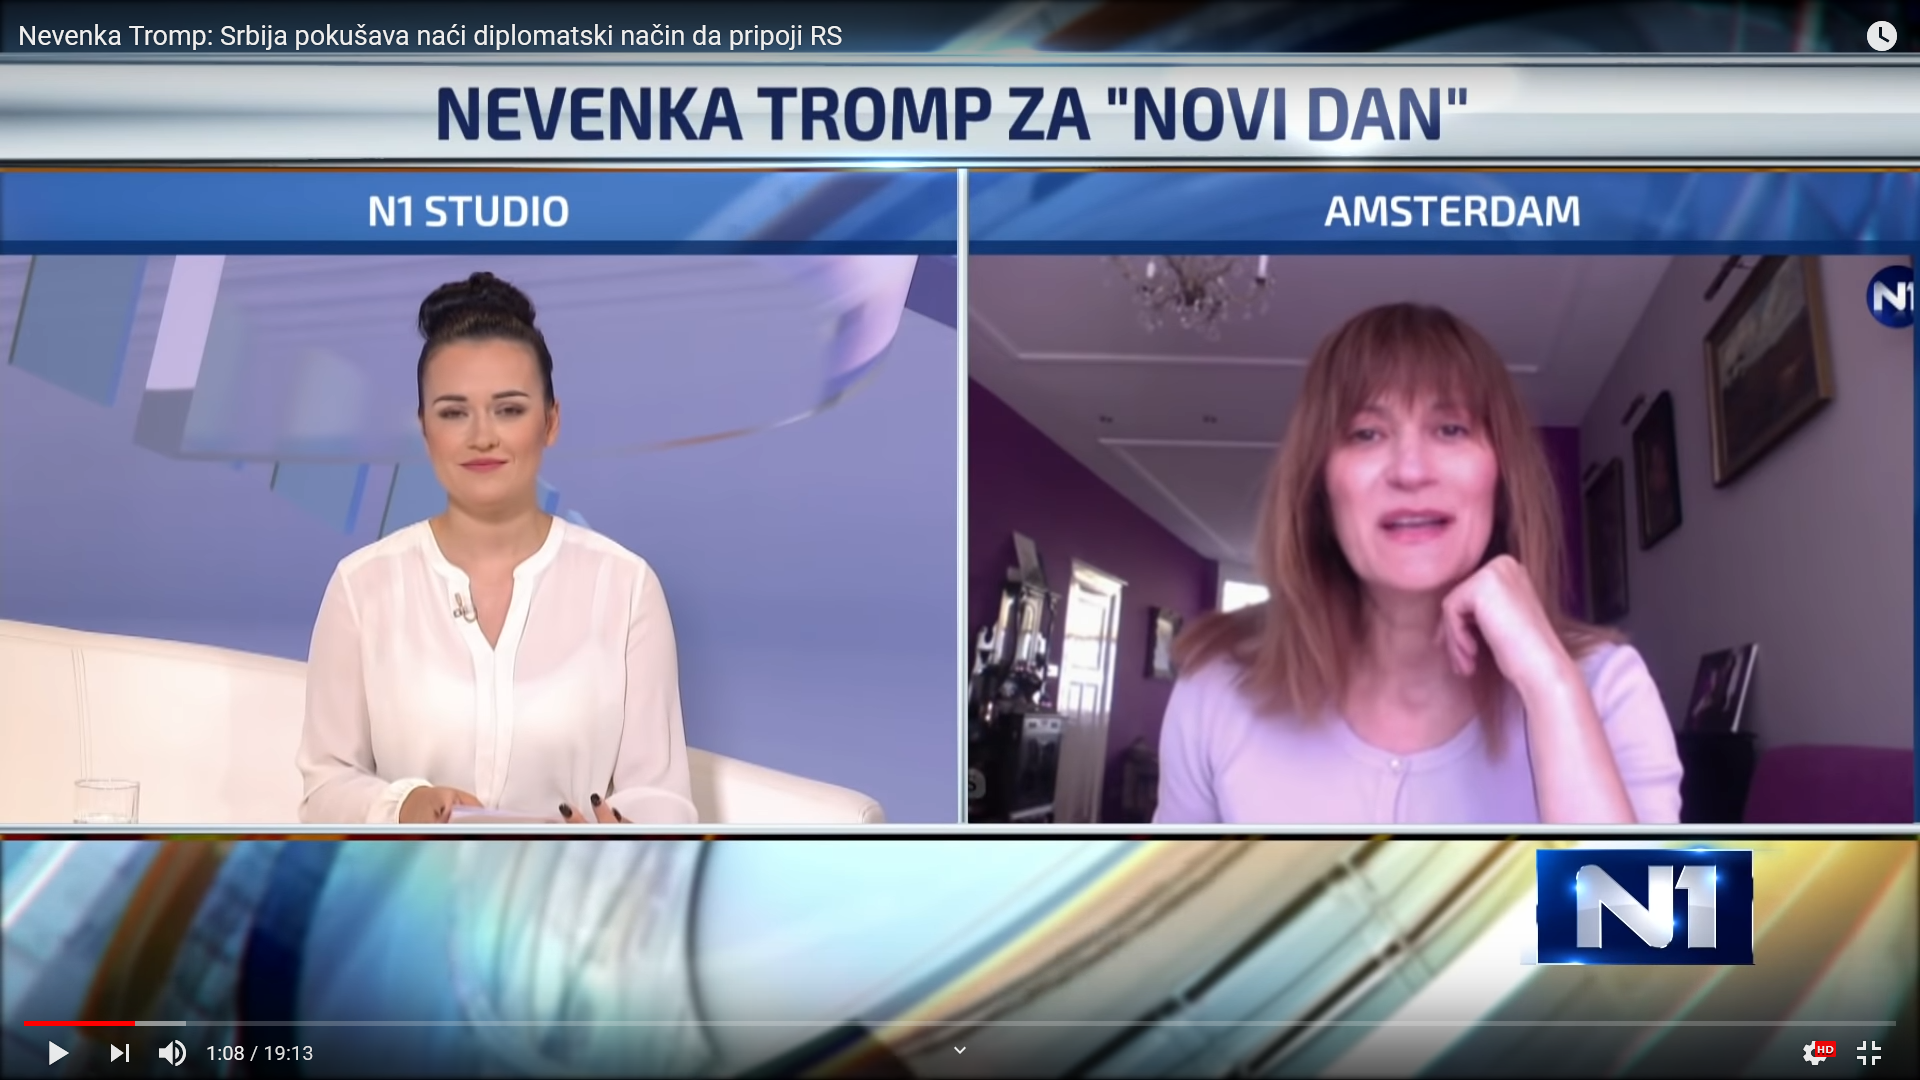 Nevenka Tromp interview, N1 TV